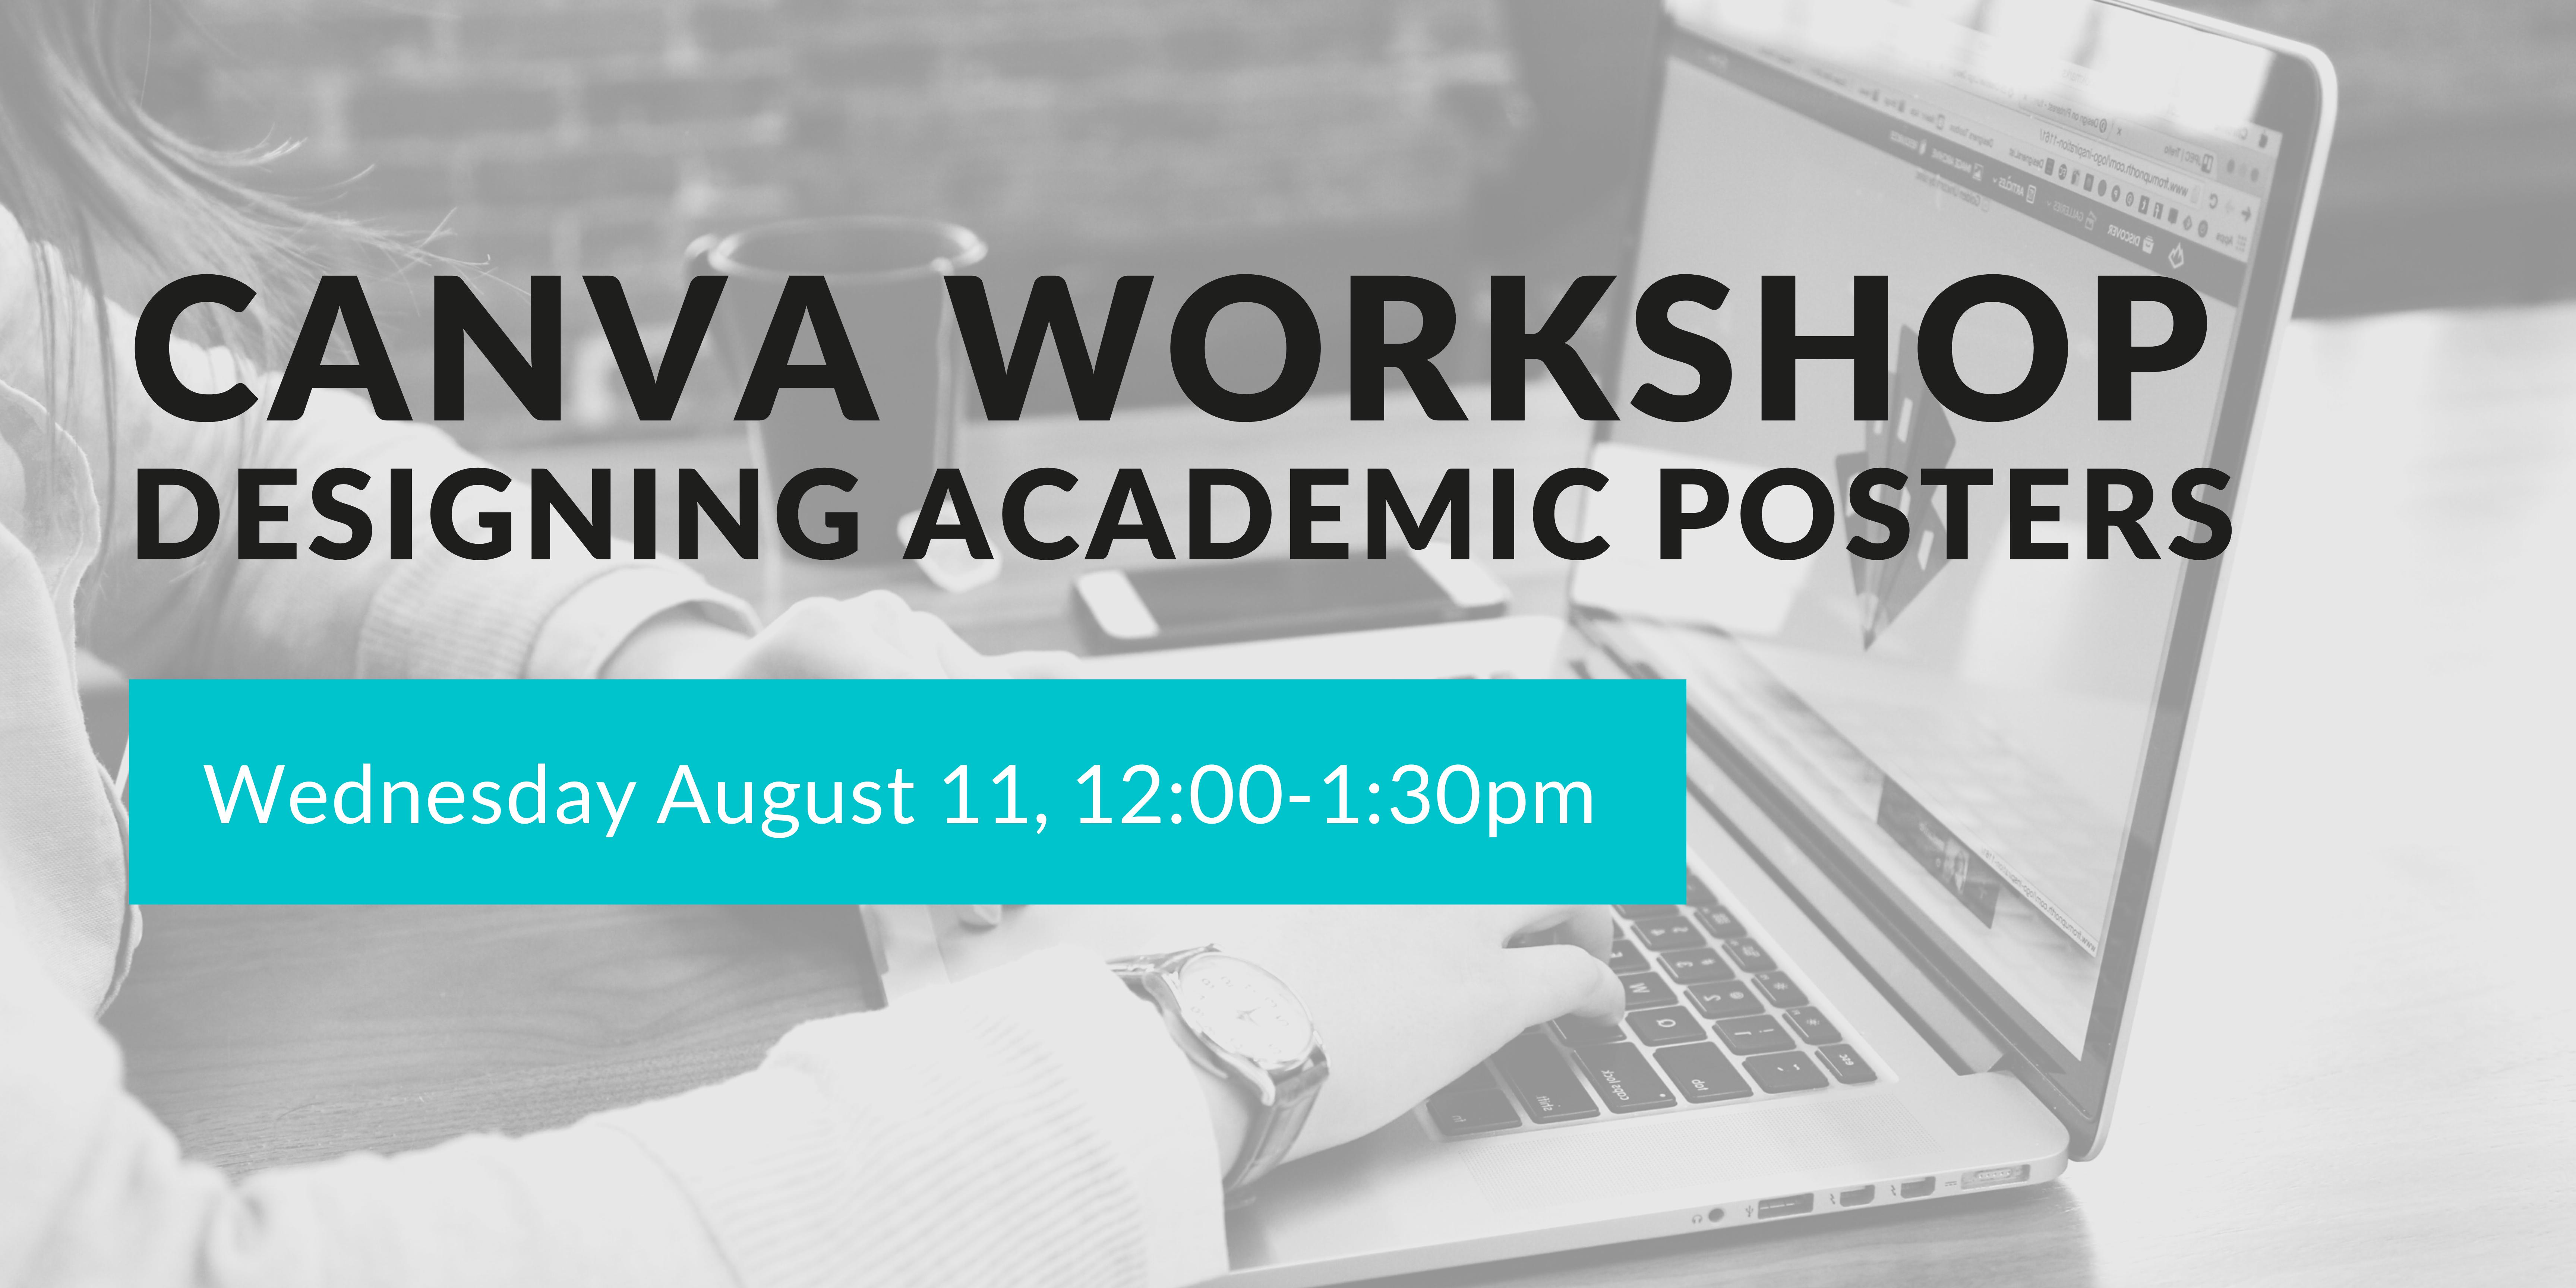 Canva Workshop - Designing Academic Posters